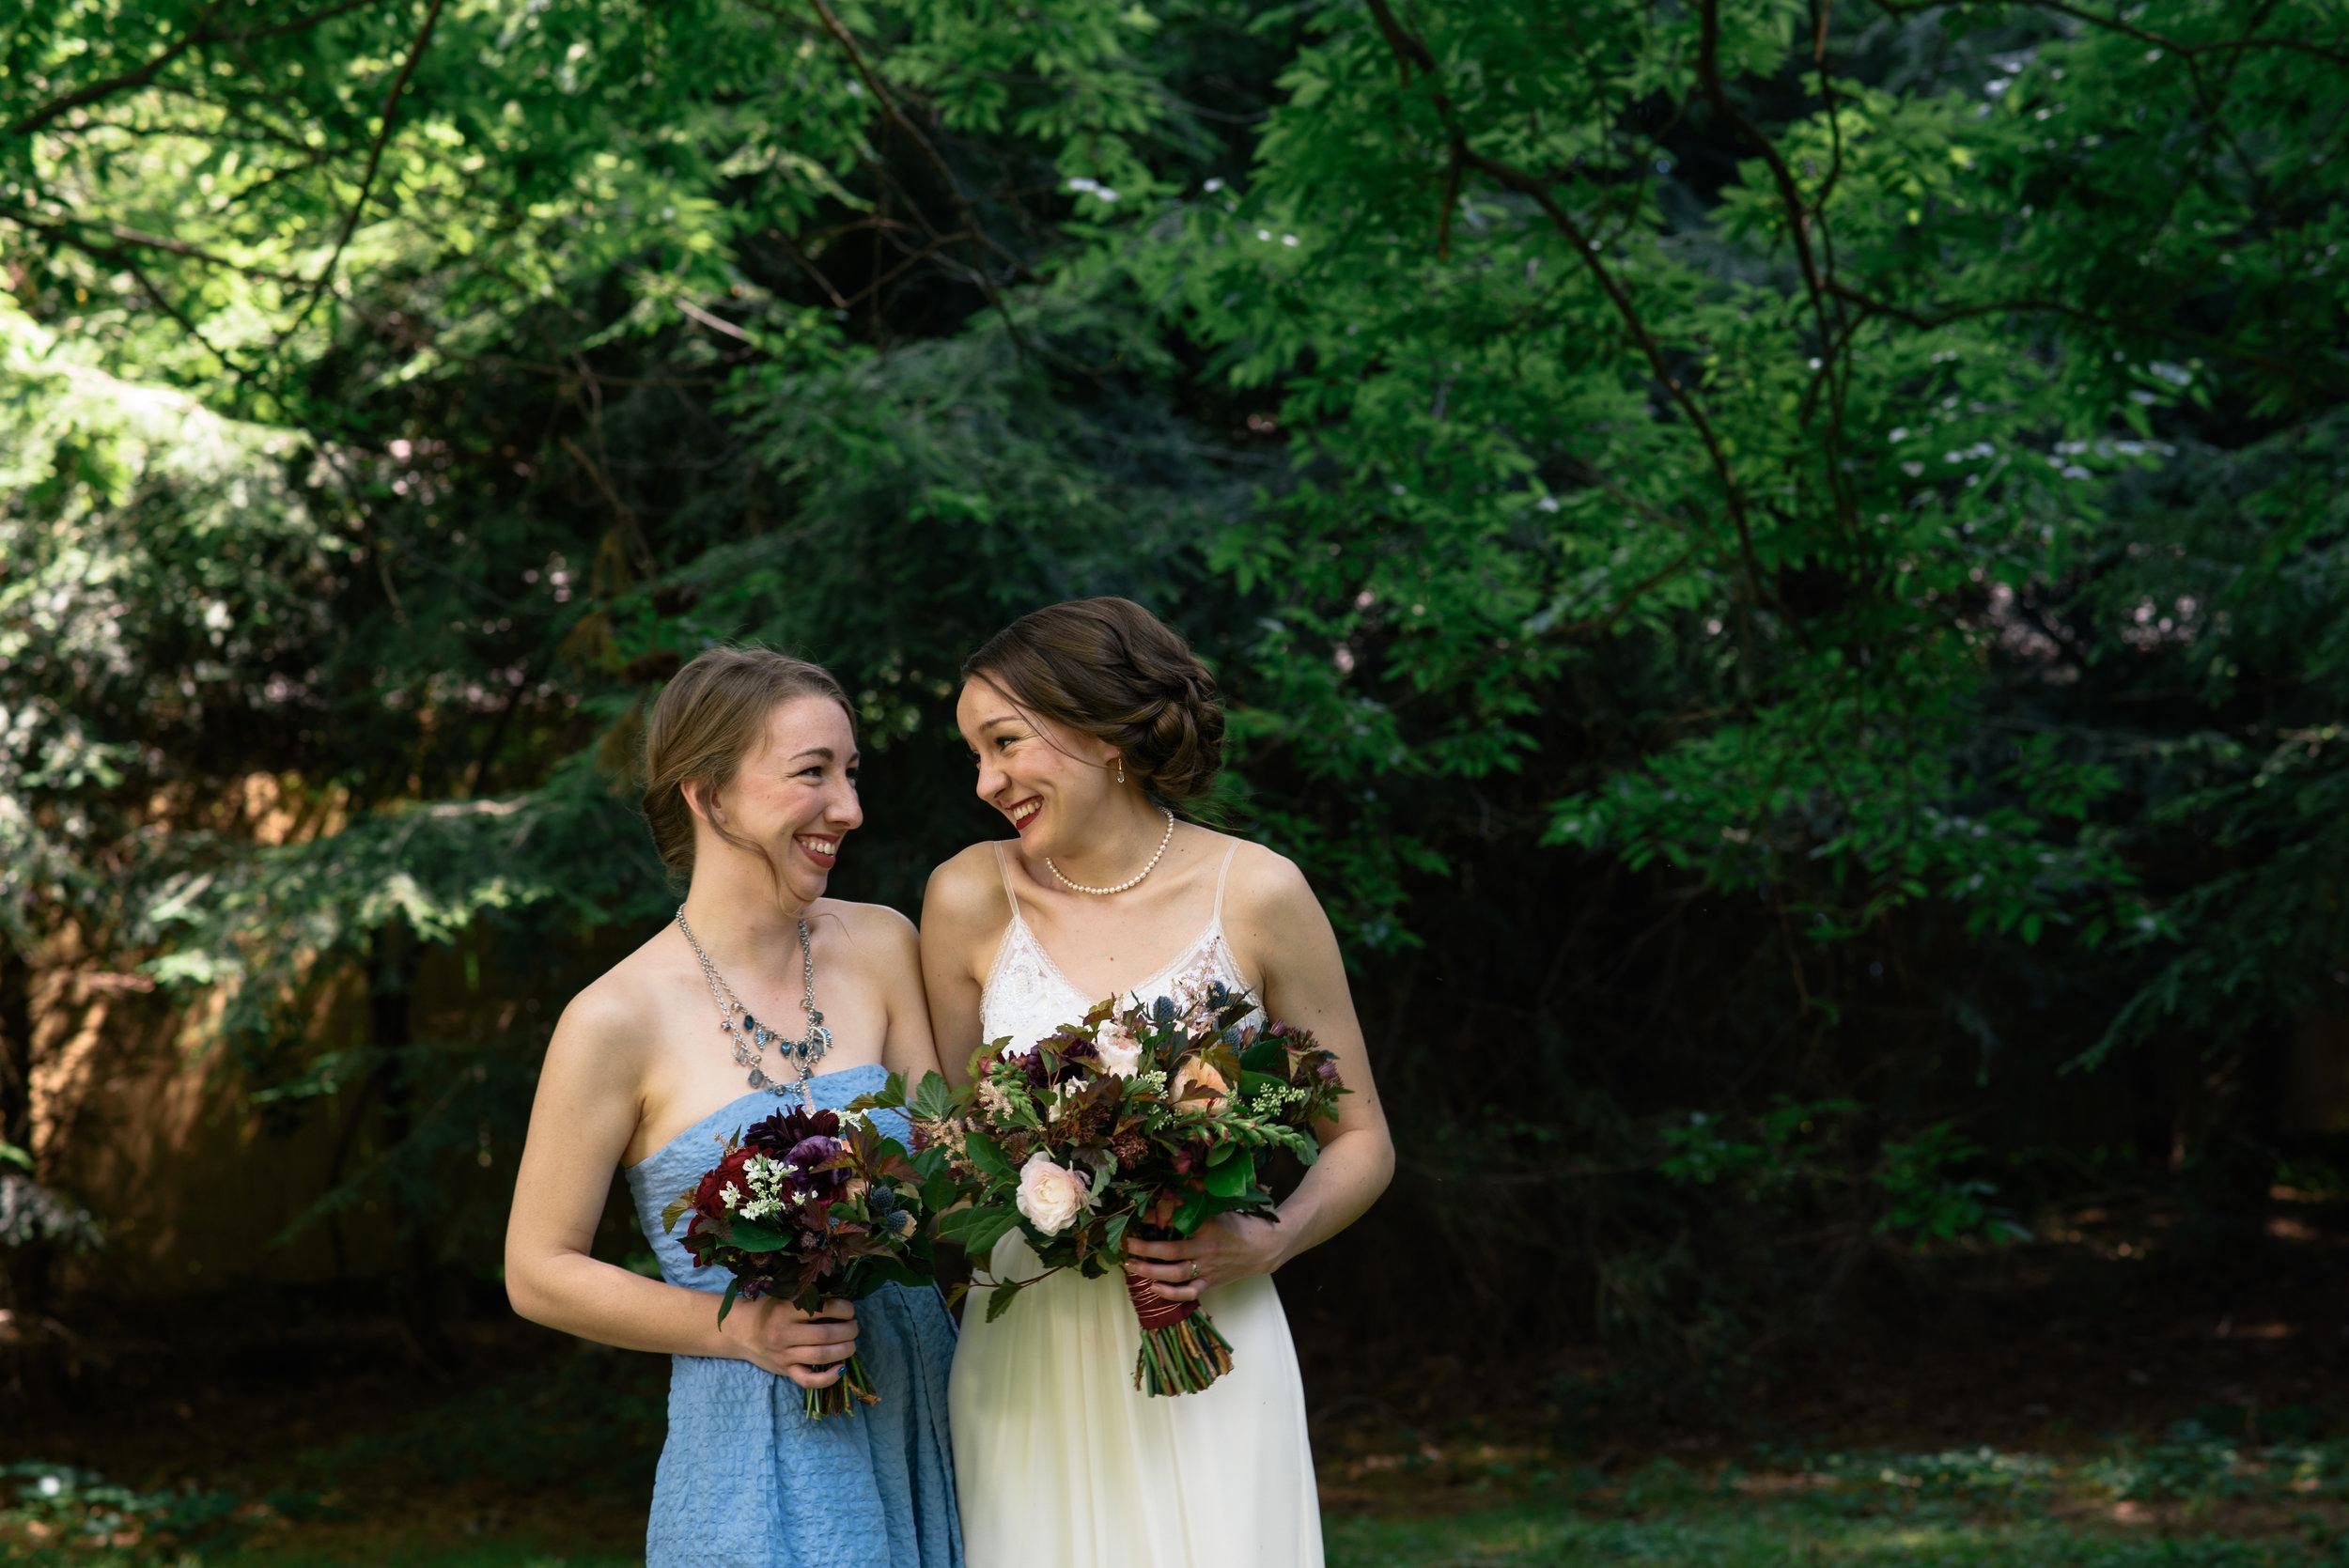 lauren-and-tim-north-carolina-wedding-meg-hill-photo- (375 of 511).jpg